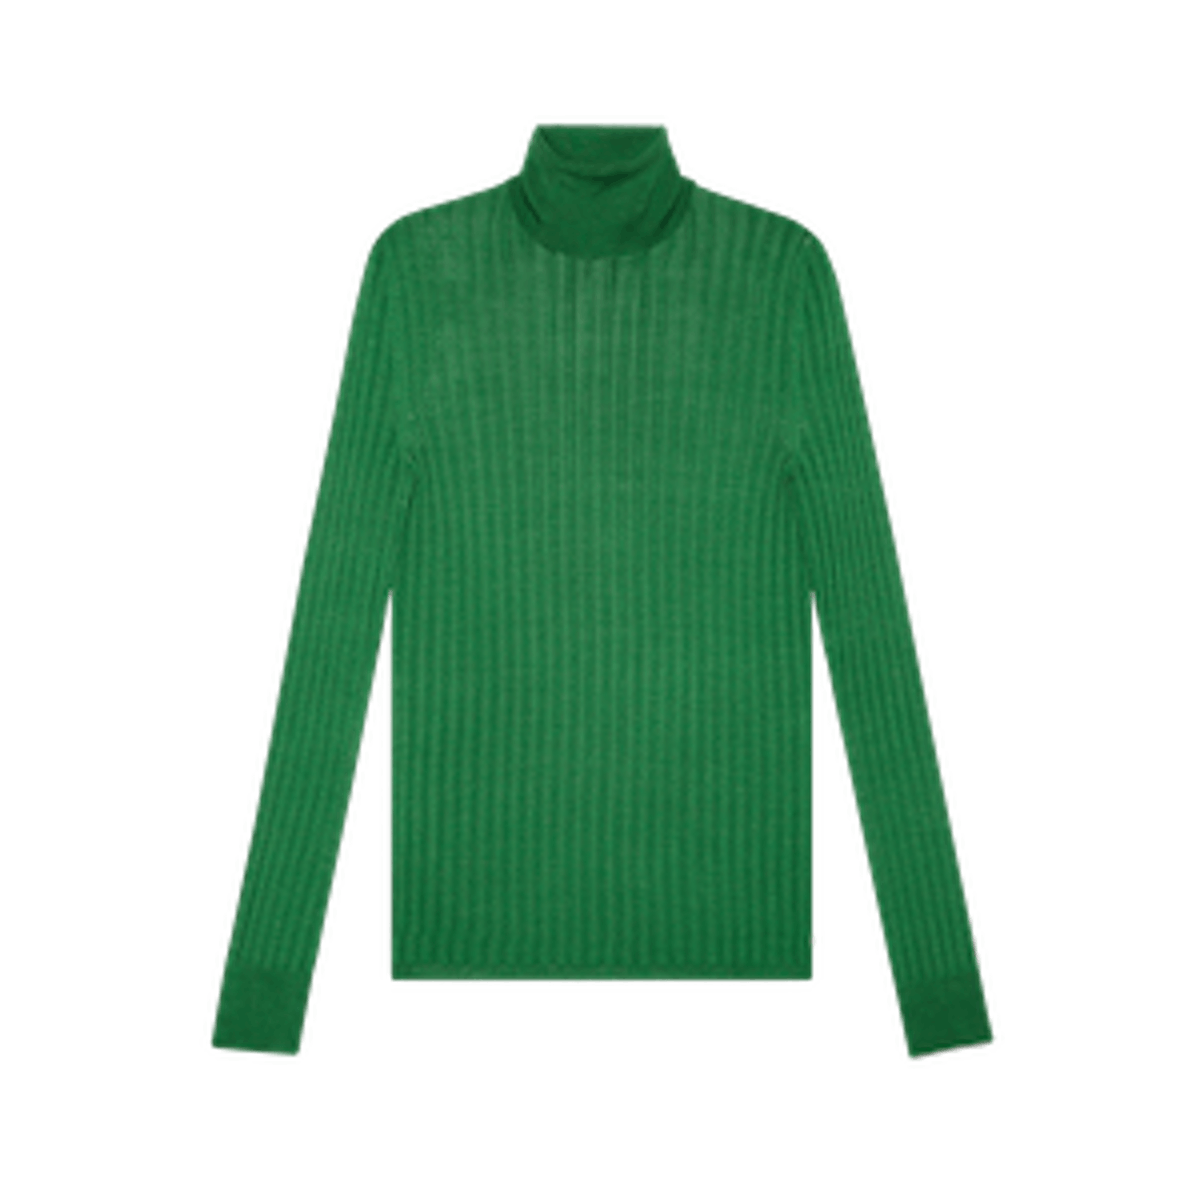 Fine Silk Turtleneck Knitted Top